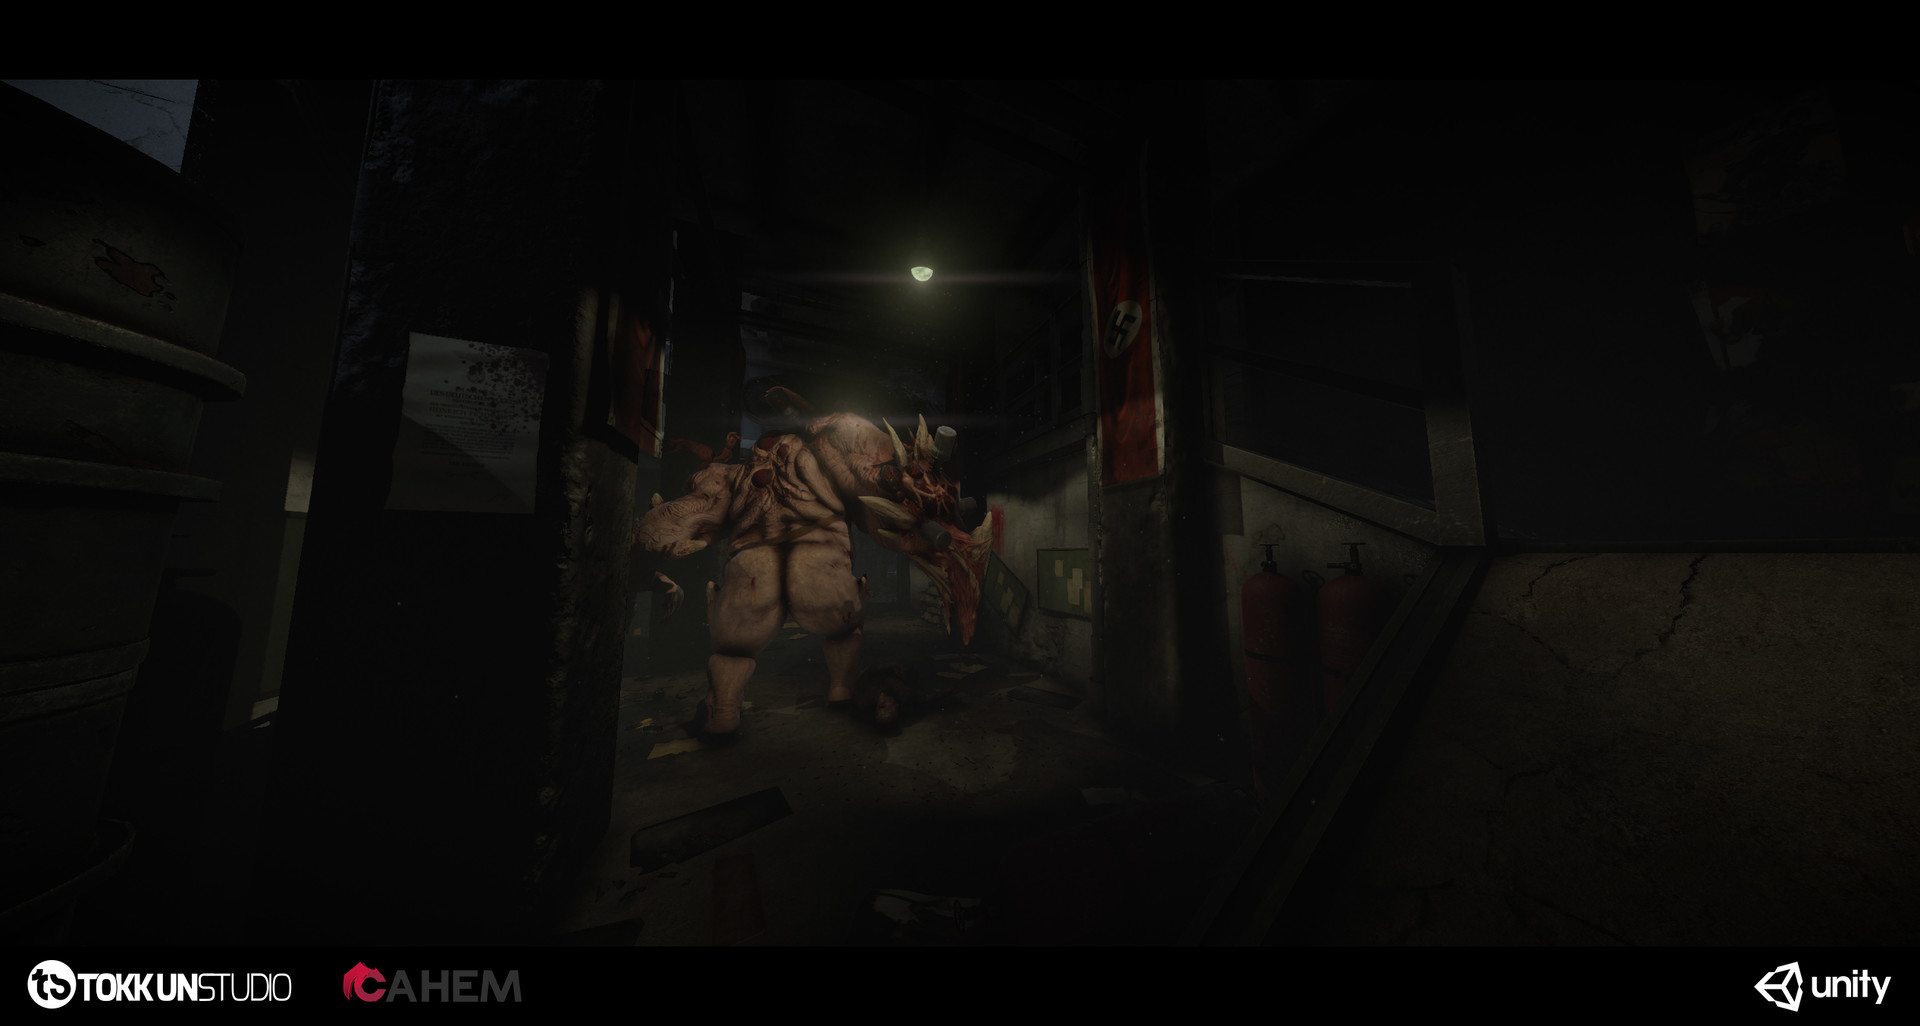 Tokkun studio bunker shot 01